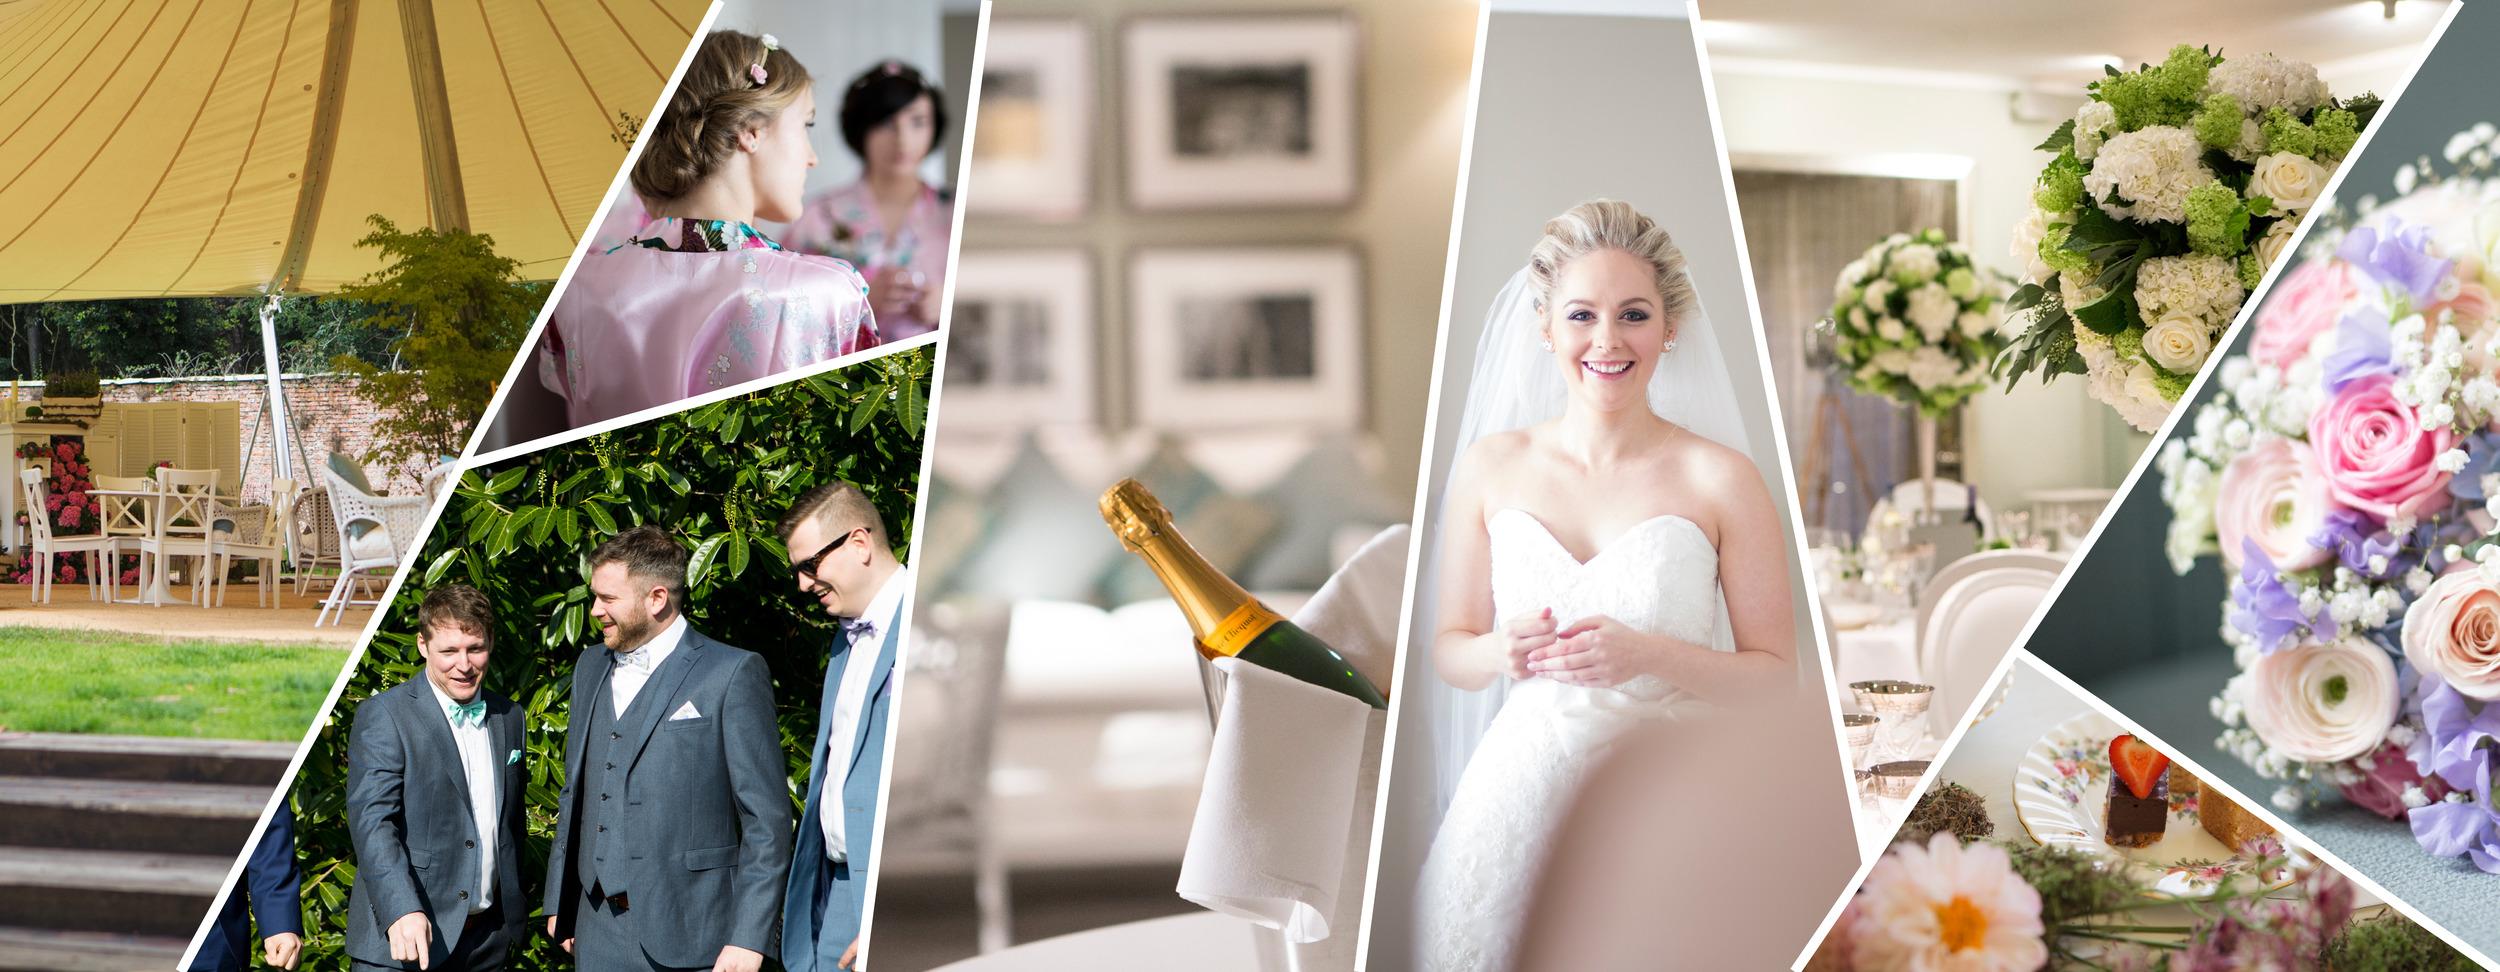 Goodwood Hotel Wedding Venue